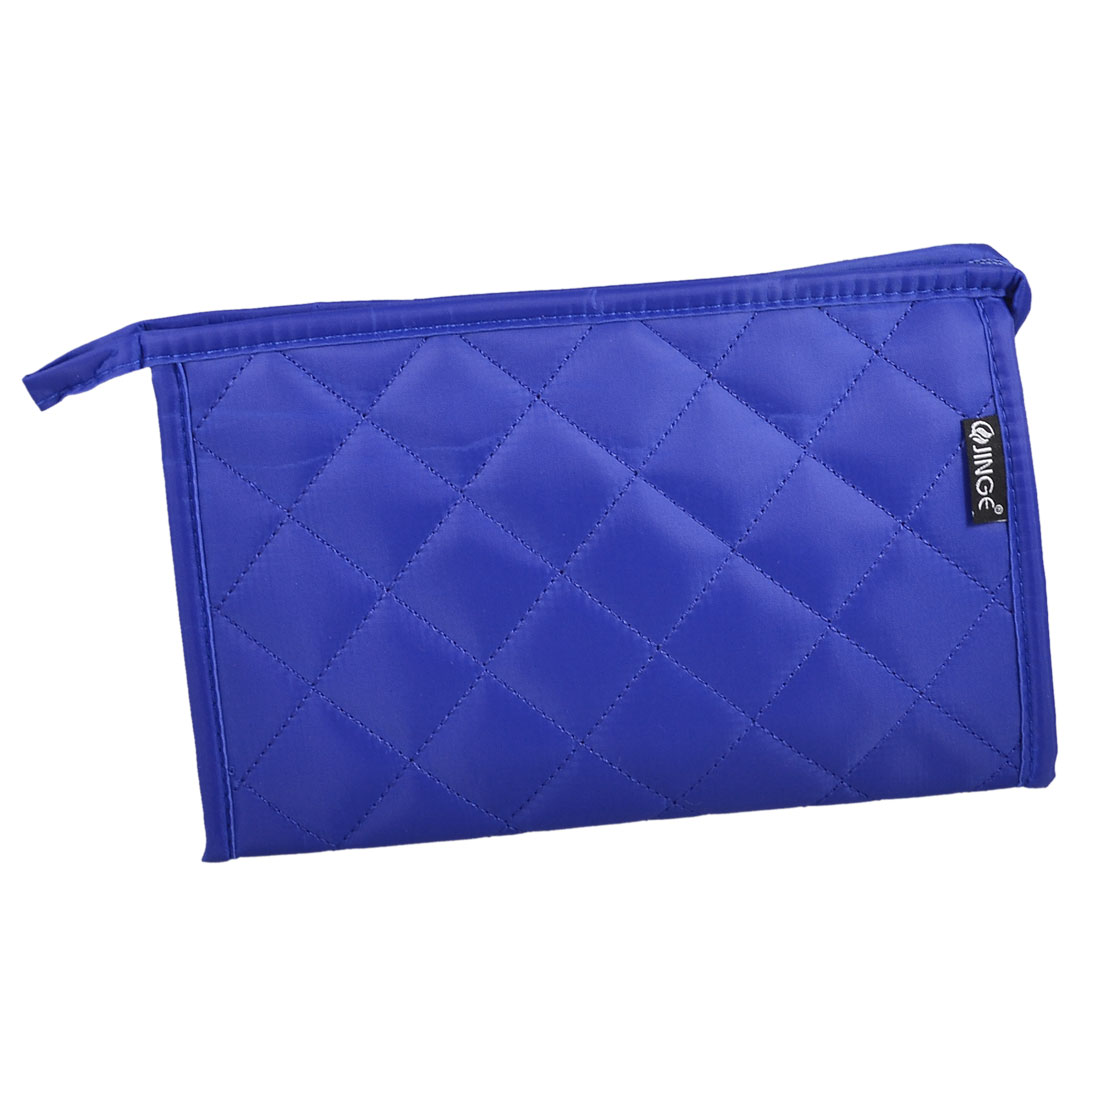 Royal Blue Plaid Zip Toiletry Case Makeup Cosmetic Bag Organizer w Mirror